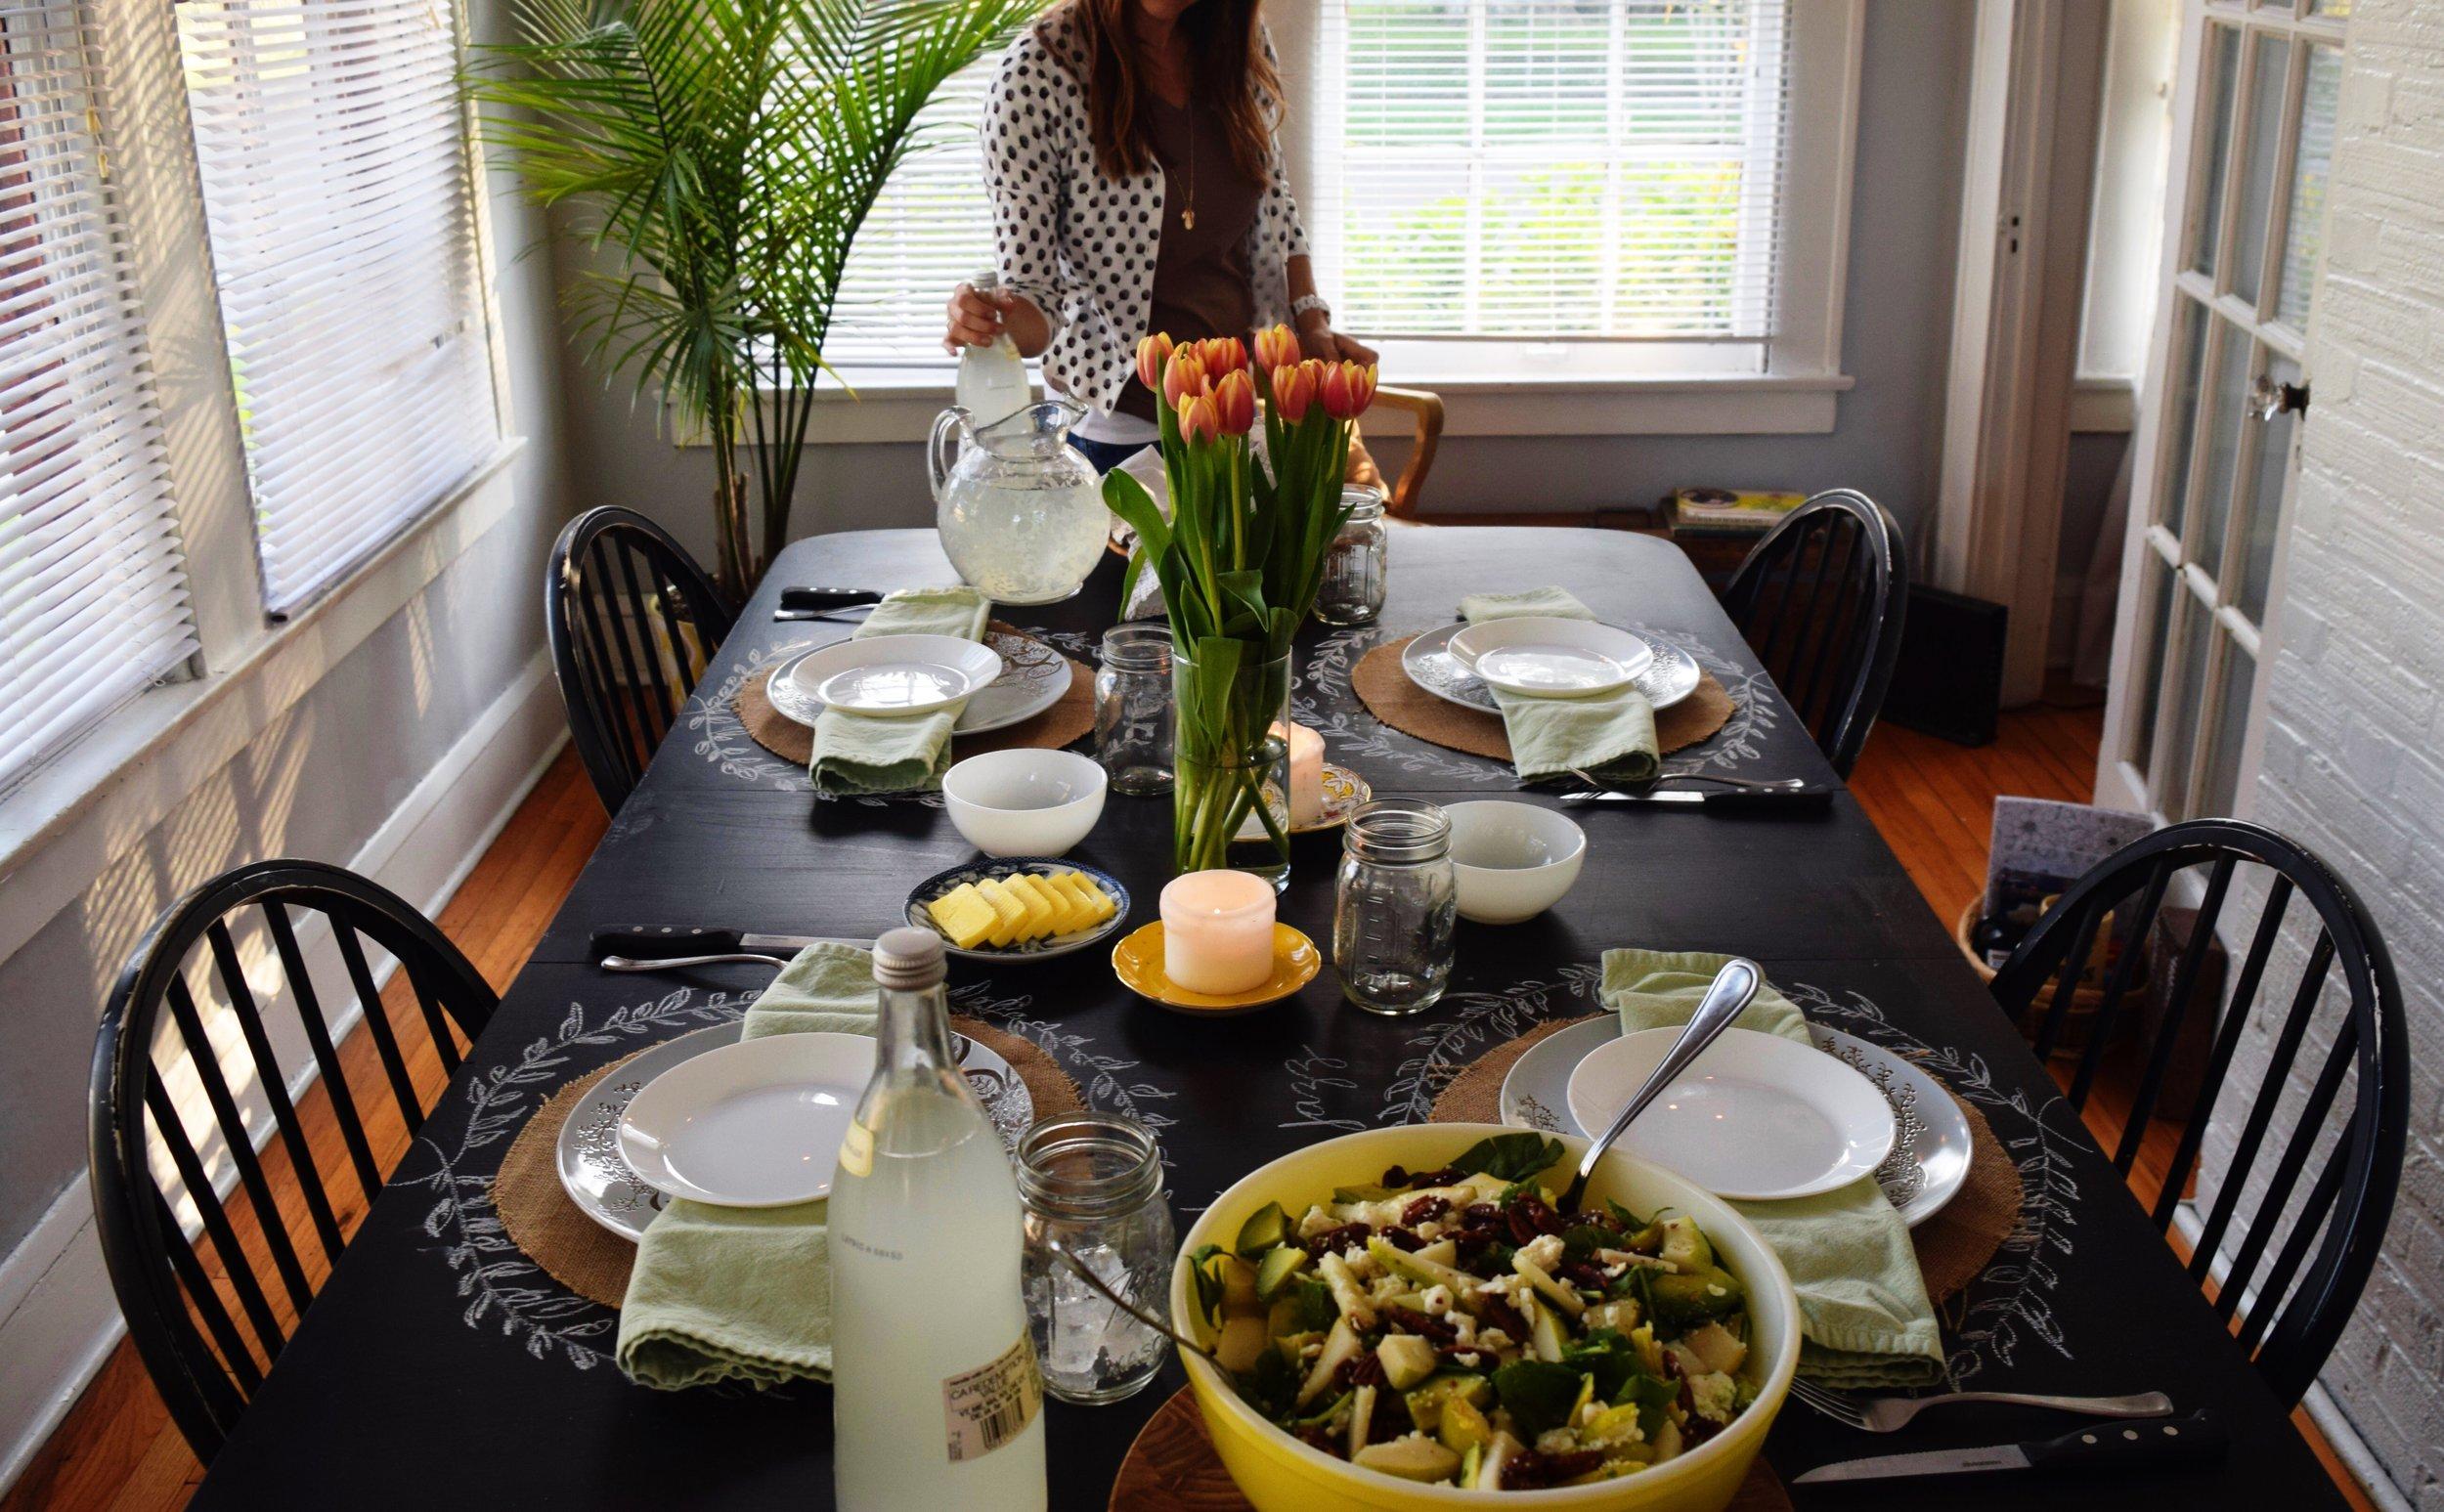 HOSTING A DINNER: PLANNING (via JacinthaPayne.com)